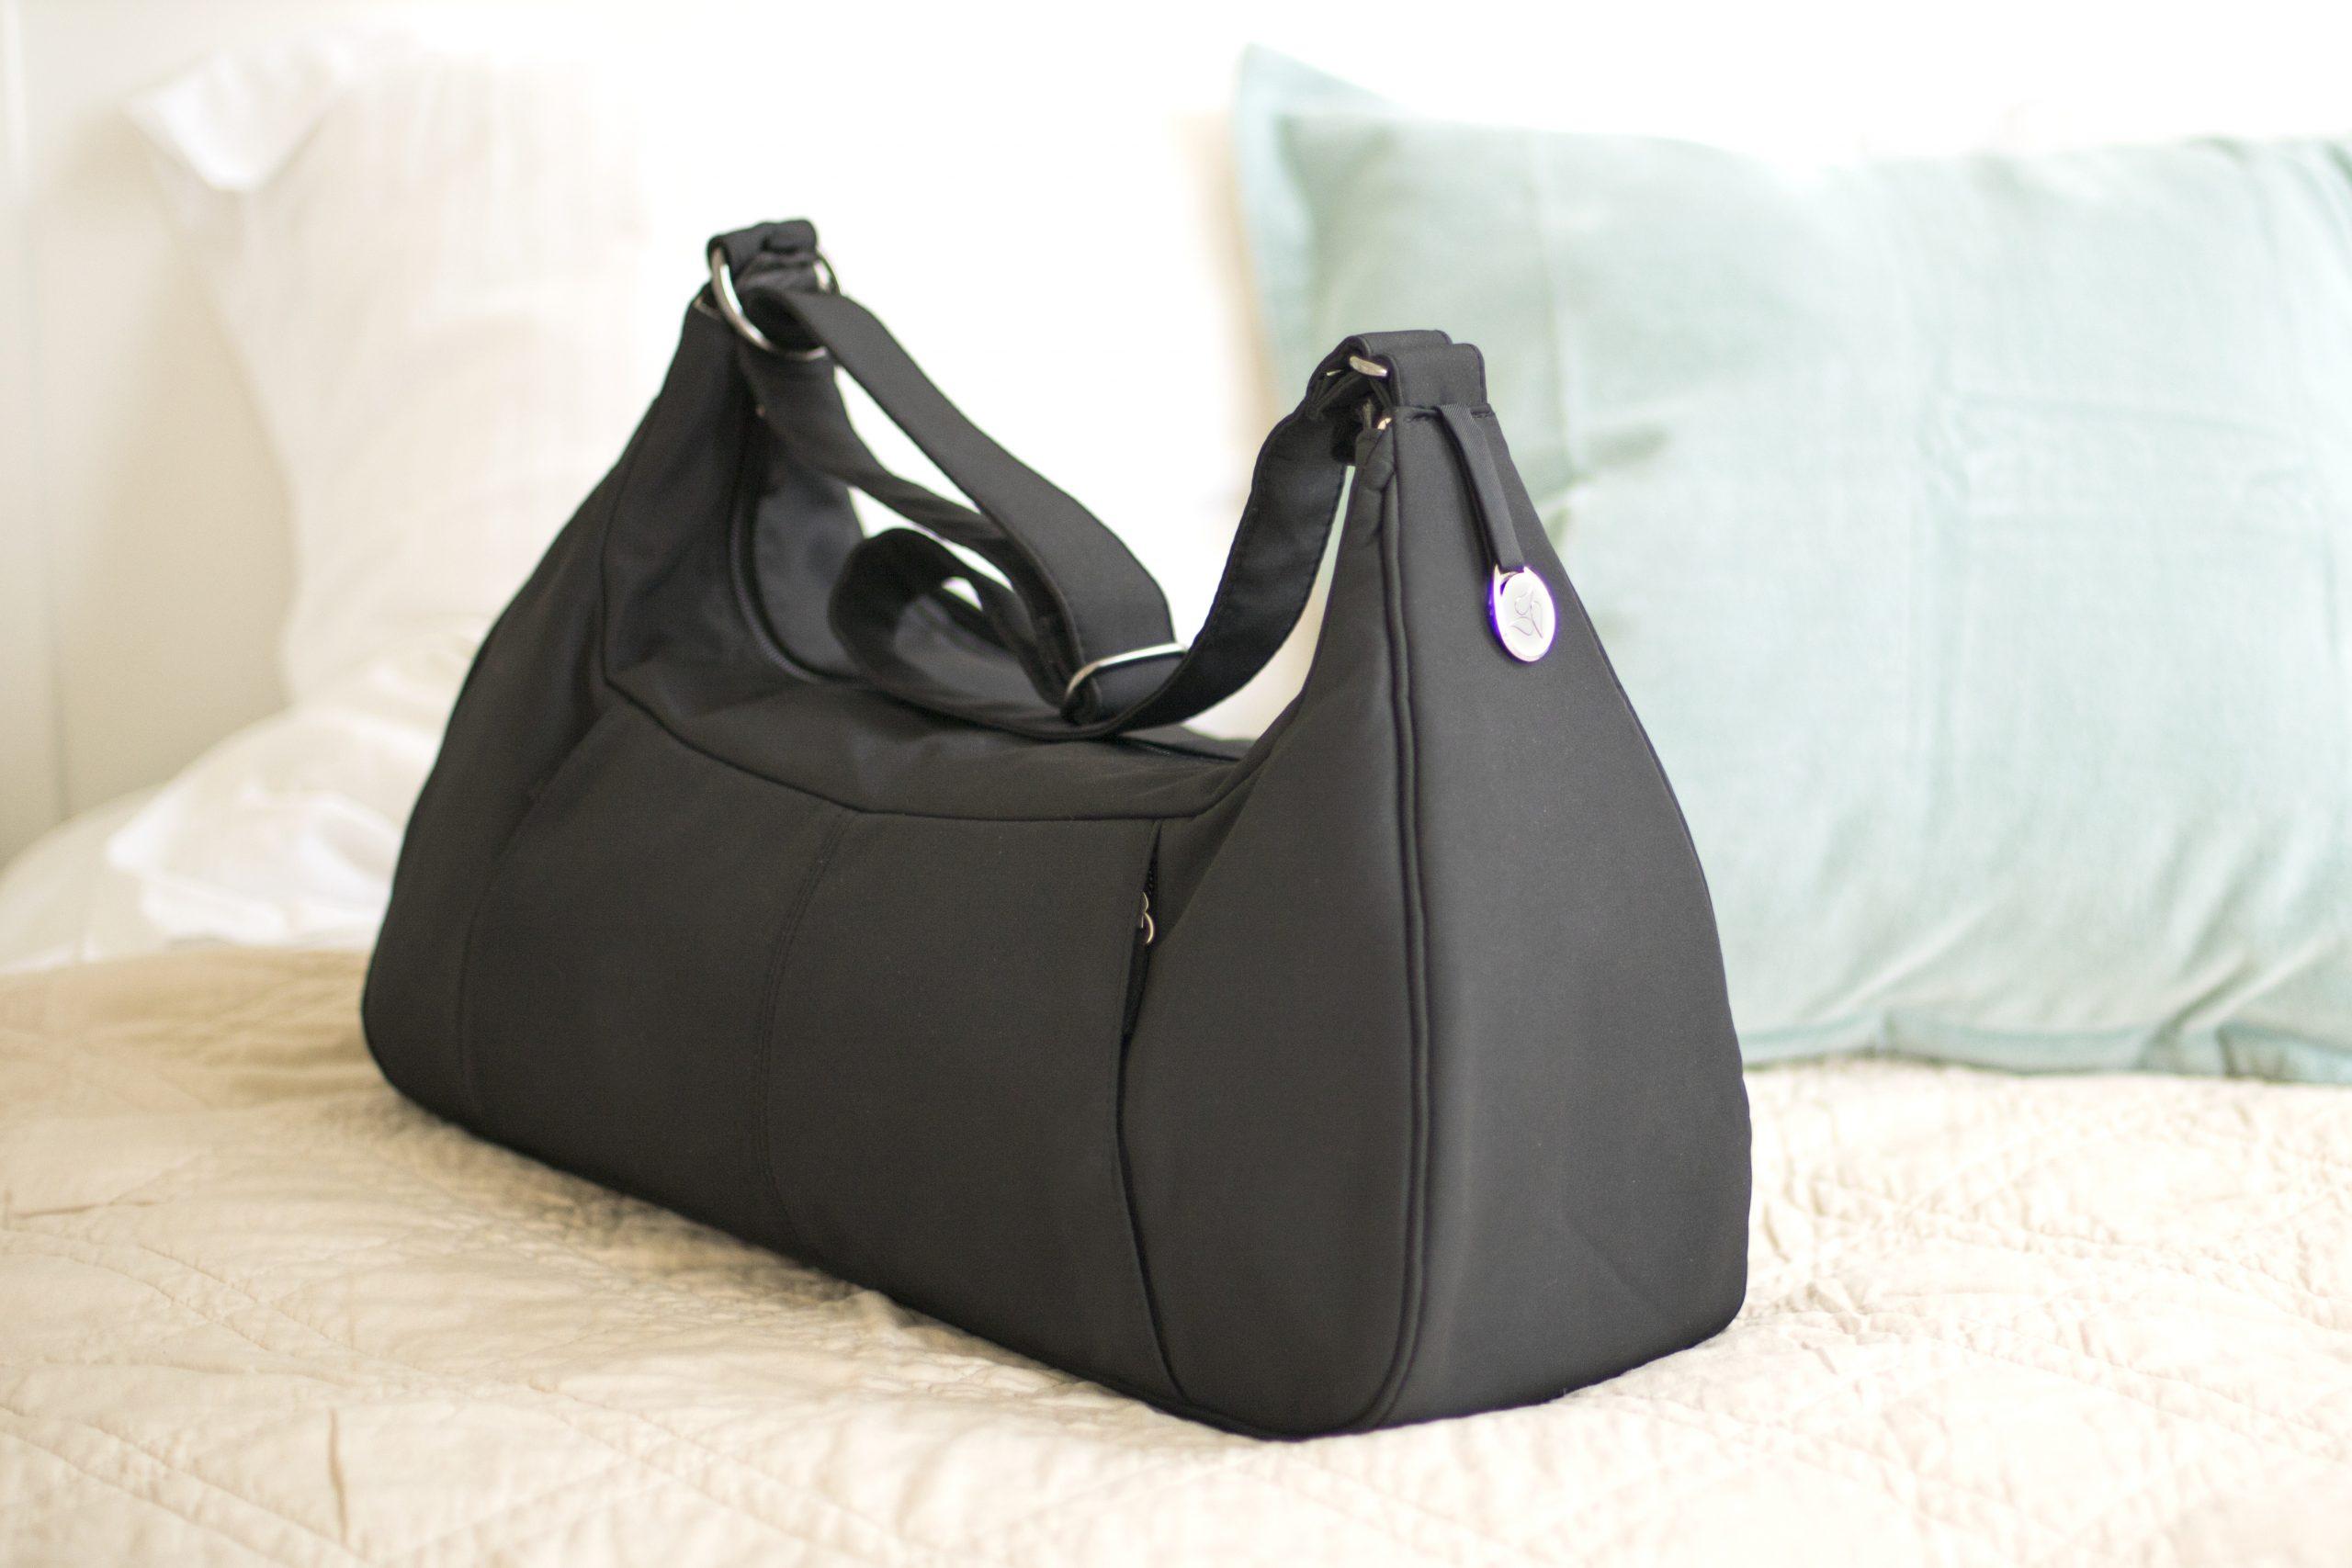 Medela Sonata Bag